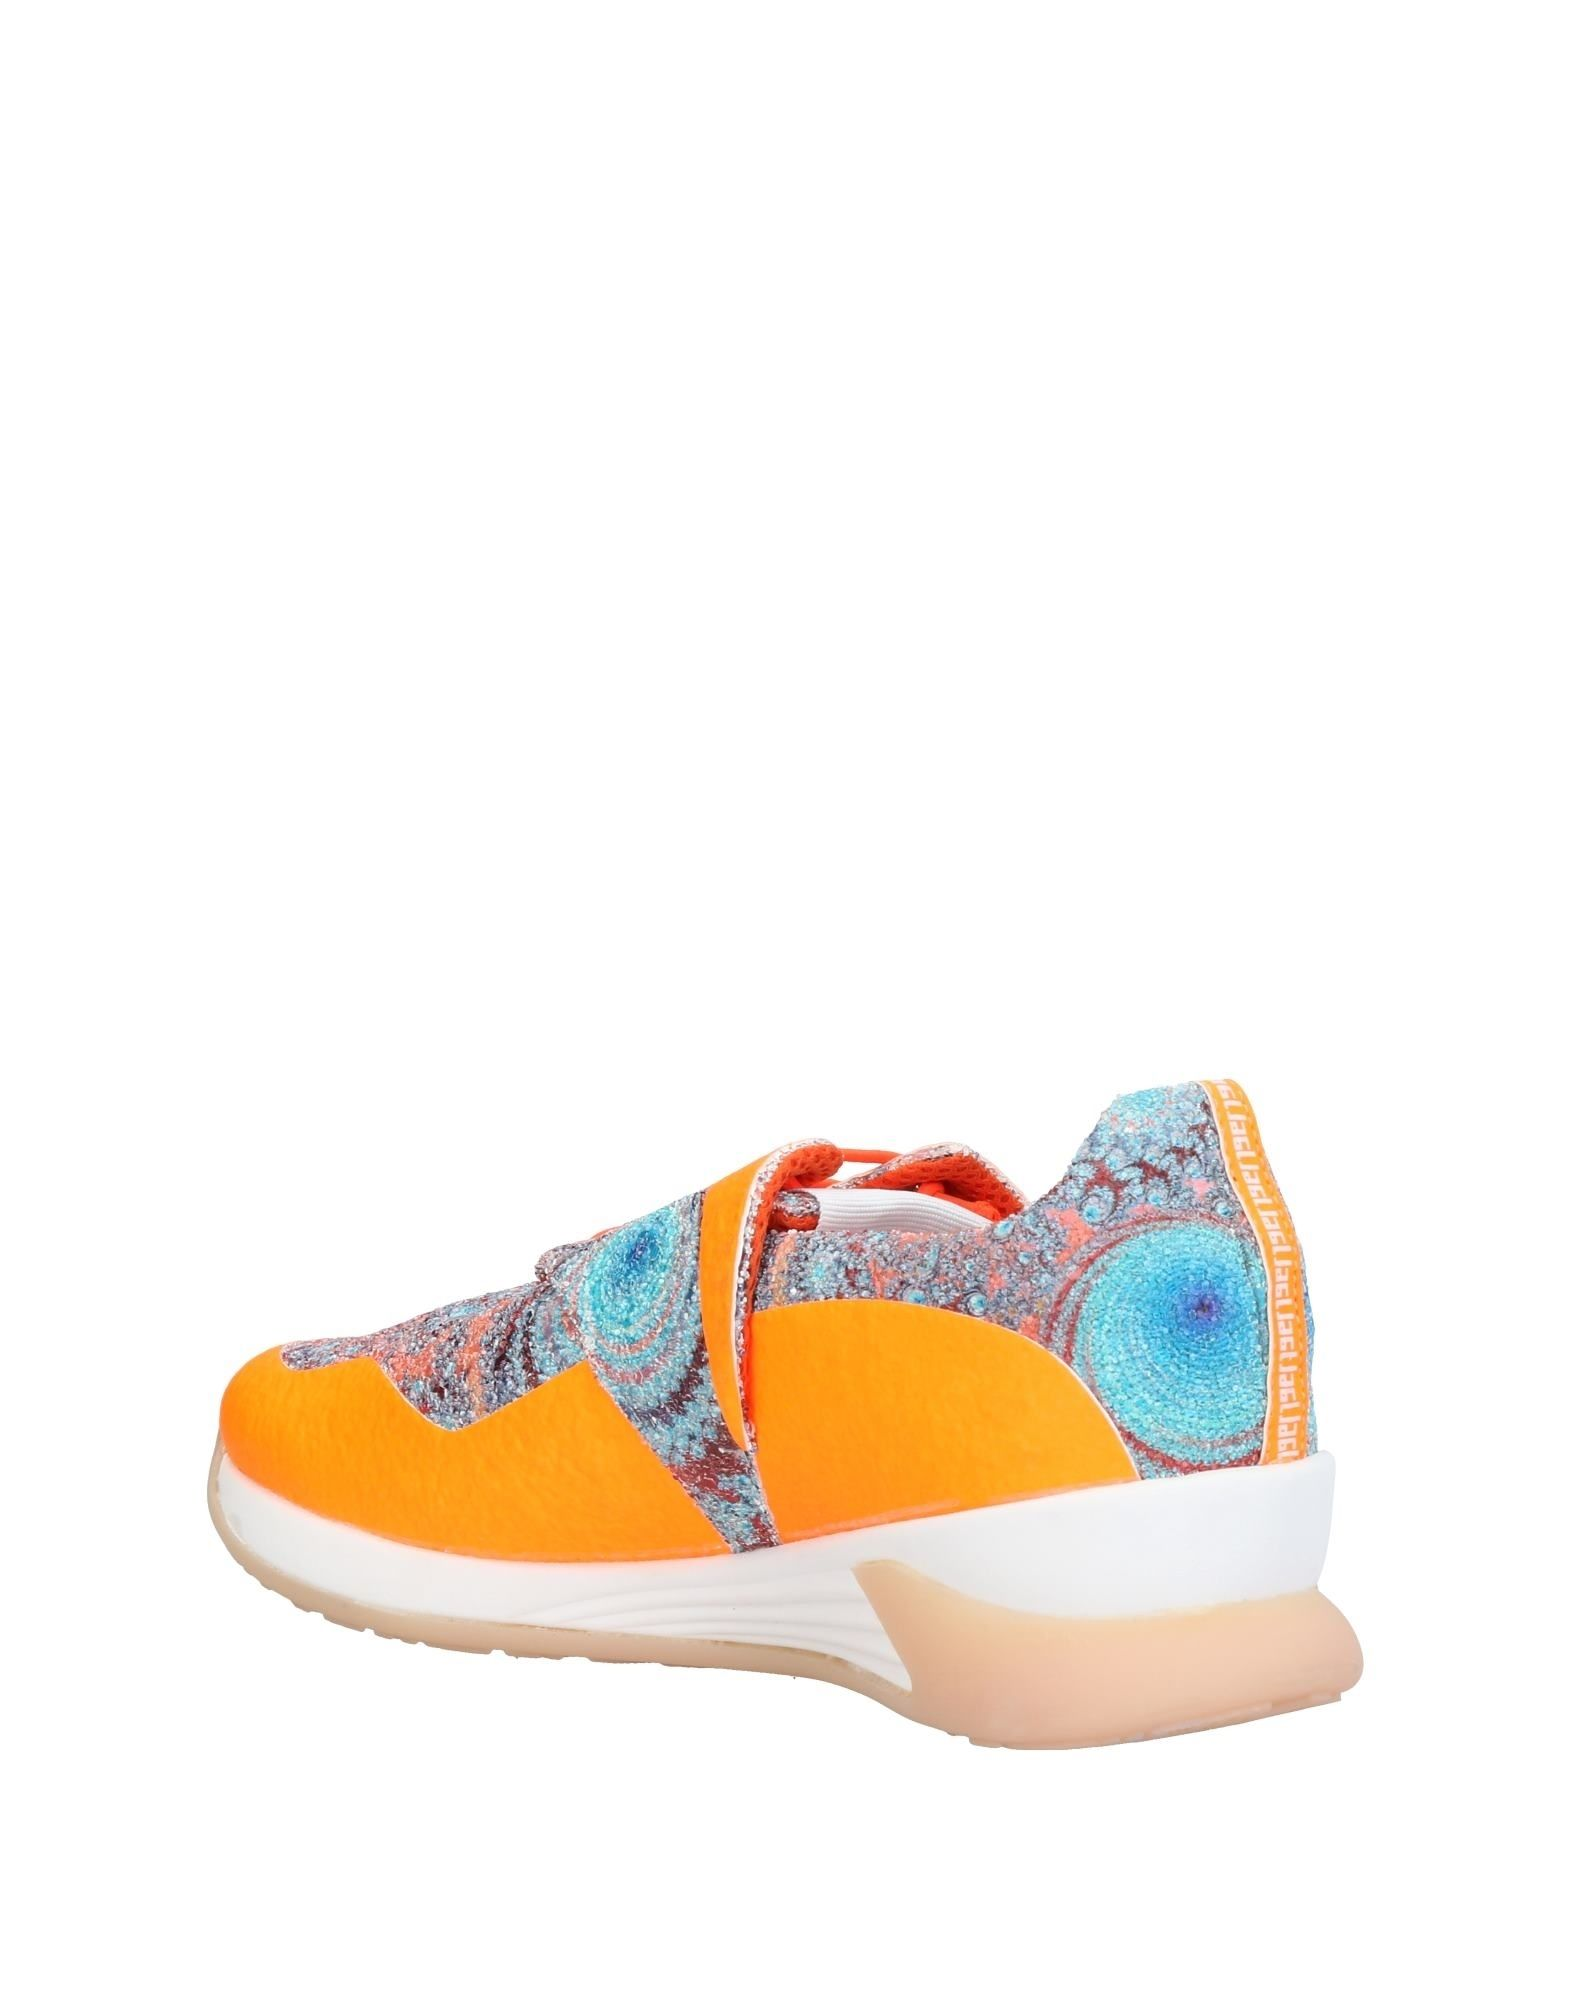 Leonardo Iachini Gute Sneakers Damen  11460385ID Gute Iachini Qualität beliebte Schuhe 86a2ec